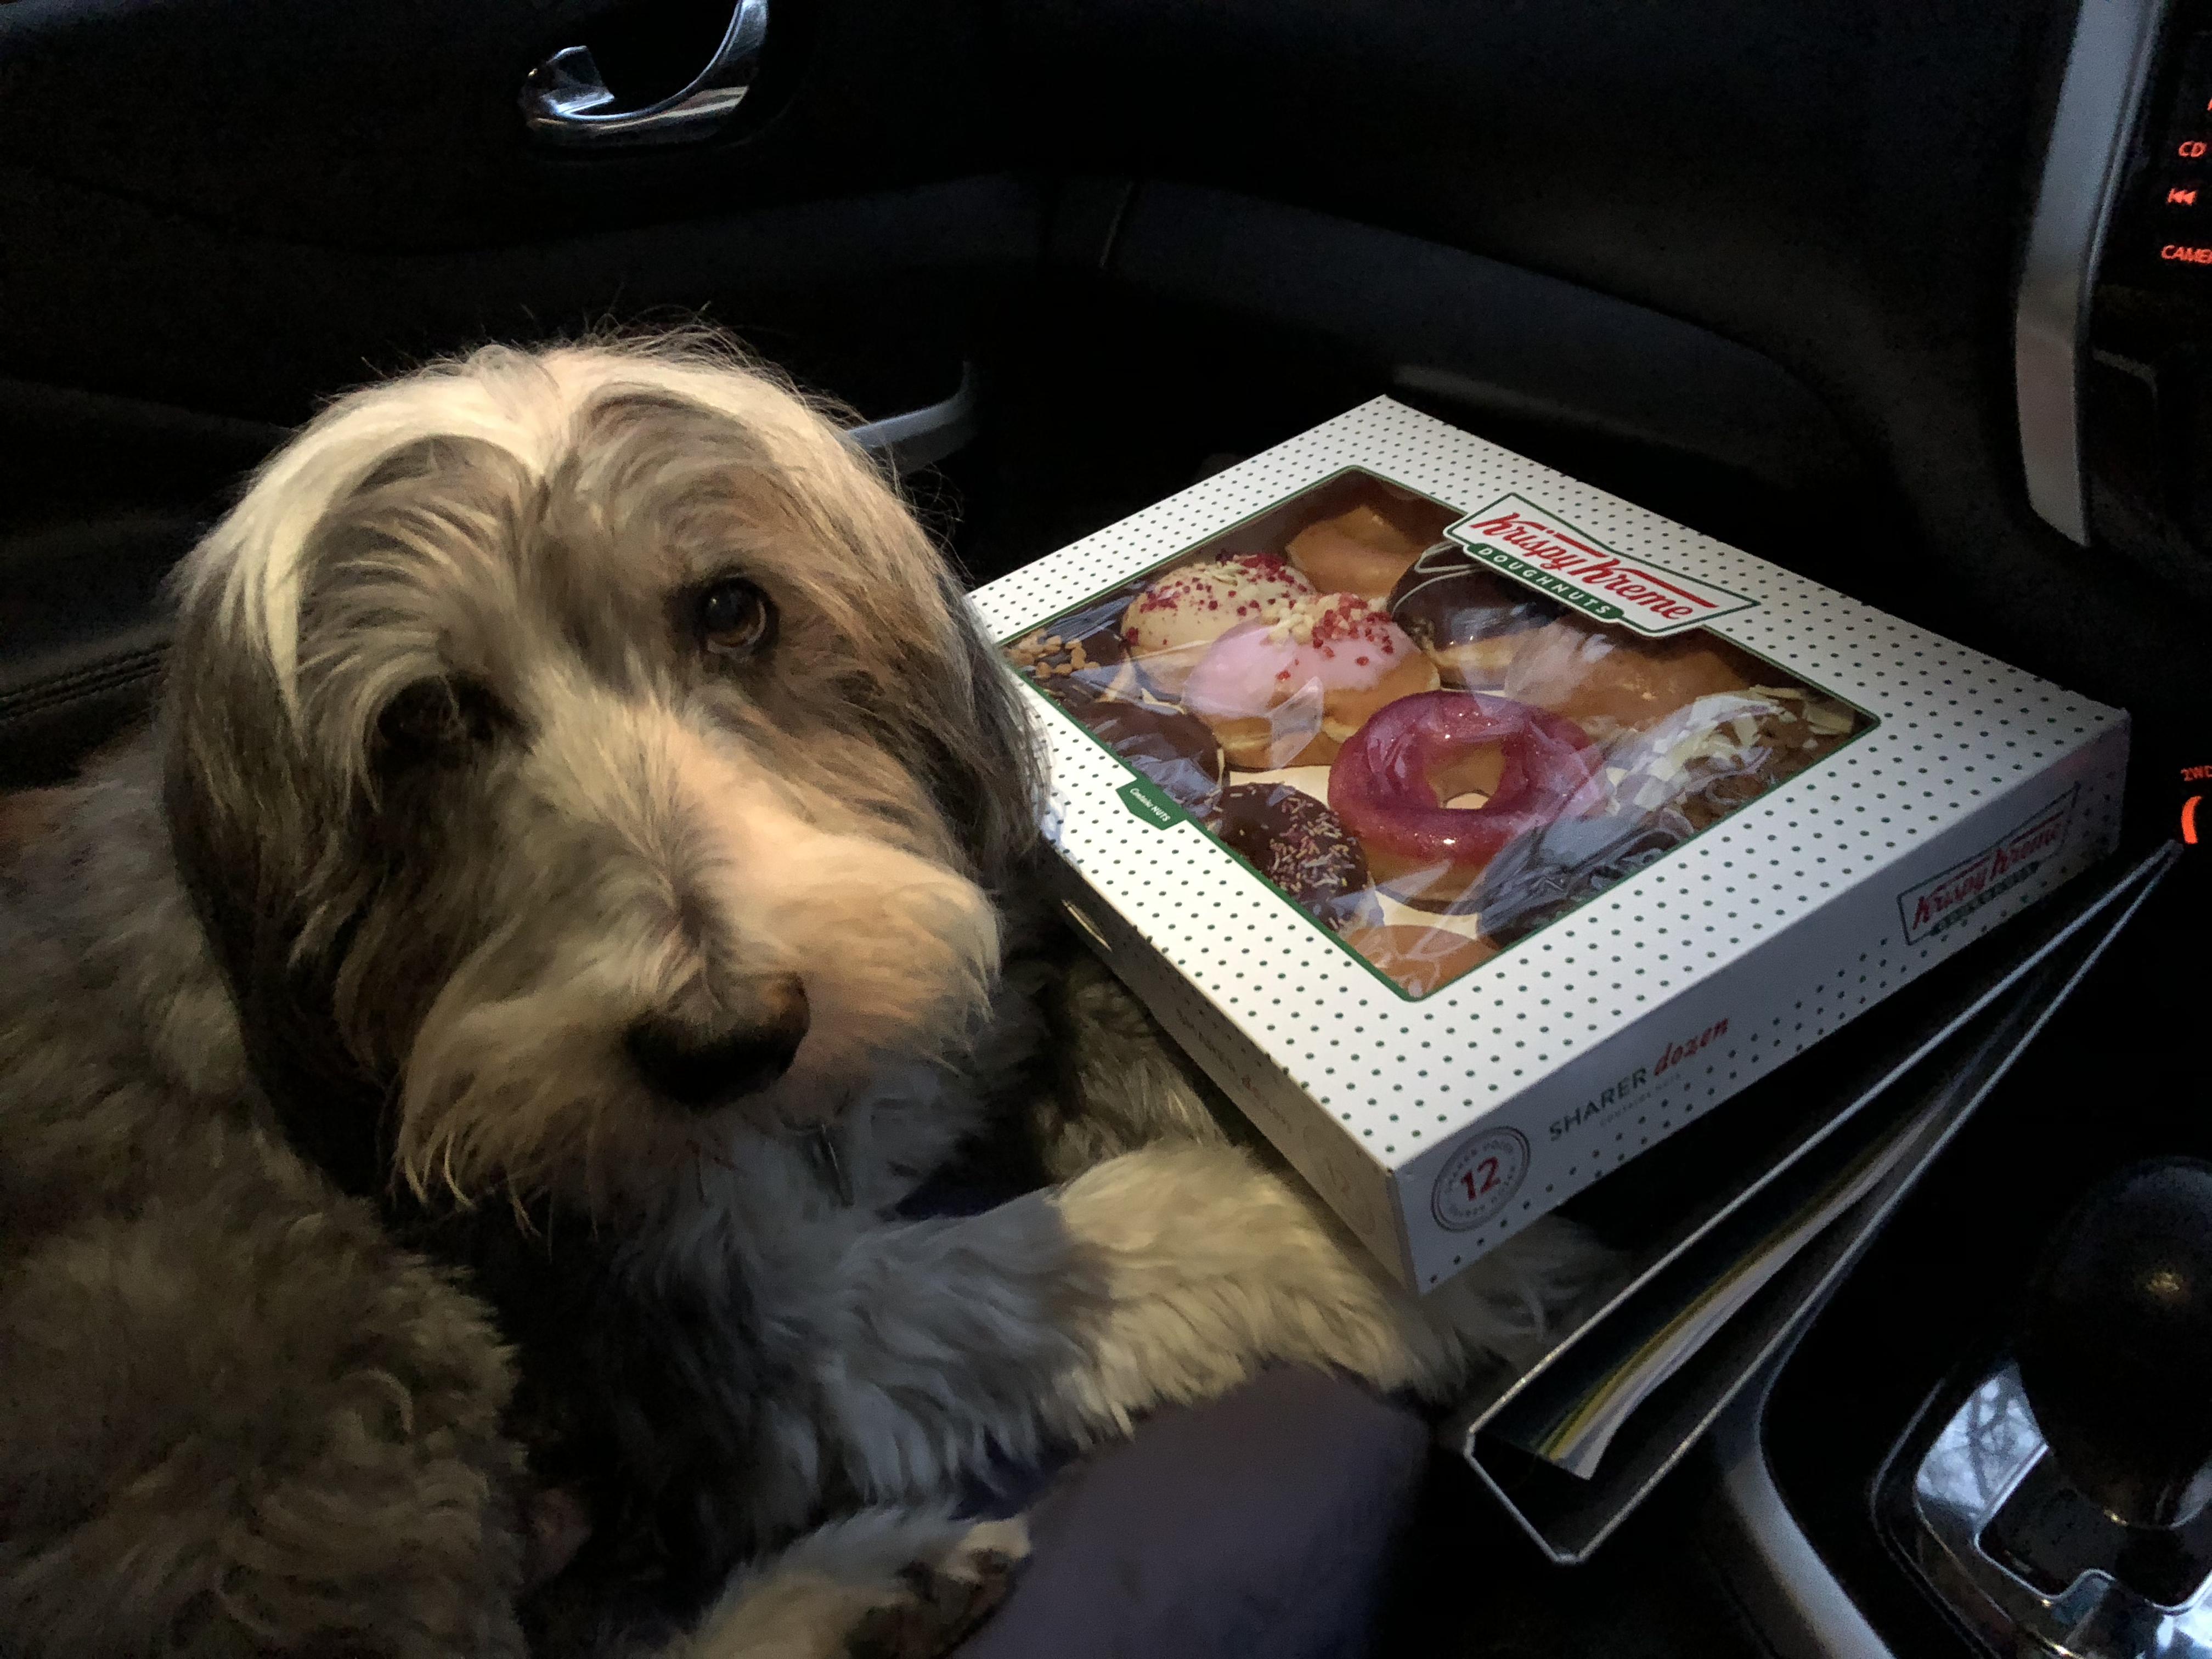 Dylan guarding the Krispy Kreme Donuts